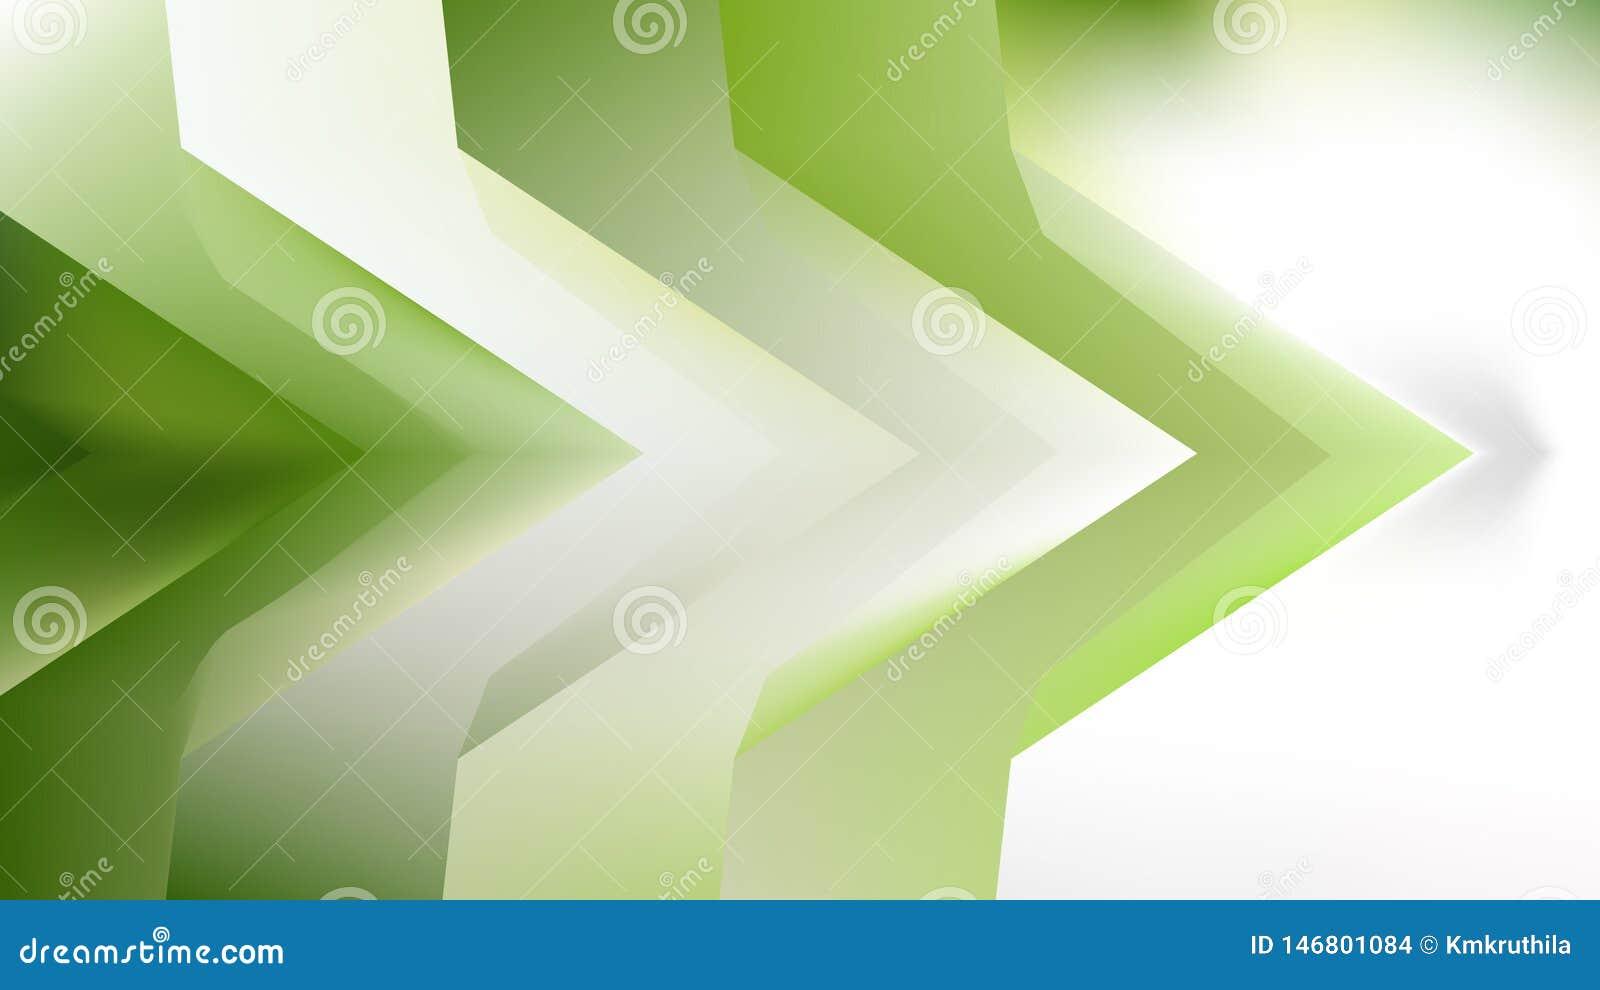 Green Line Material Property Background Beautiful elegant Illustration graphic art design Background